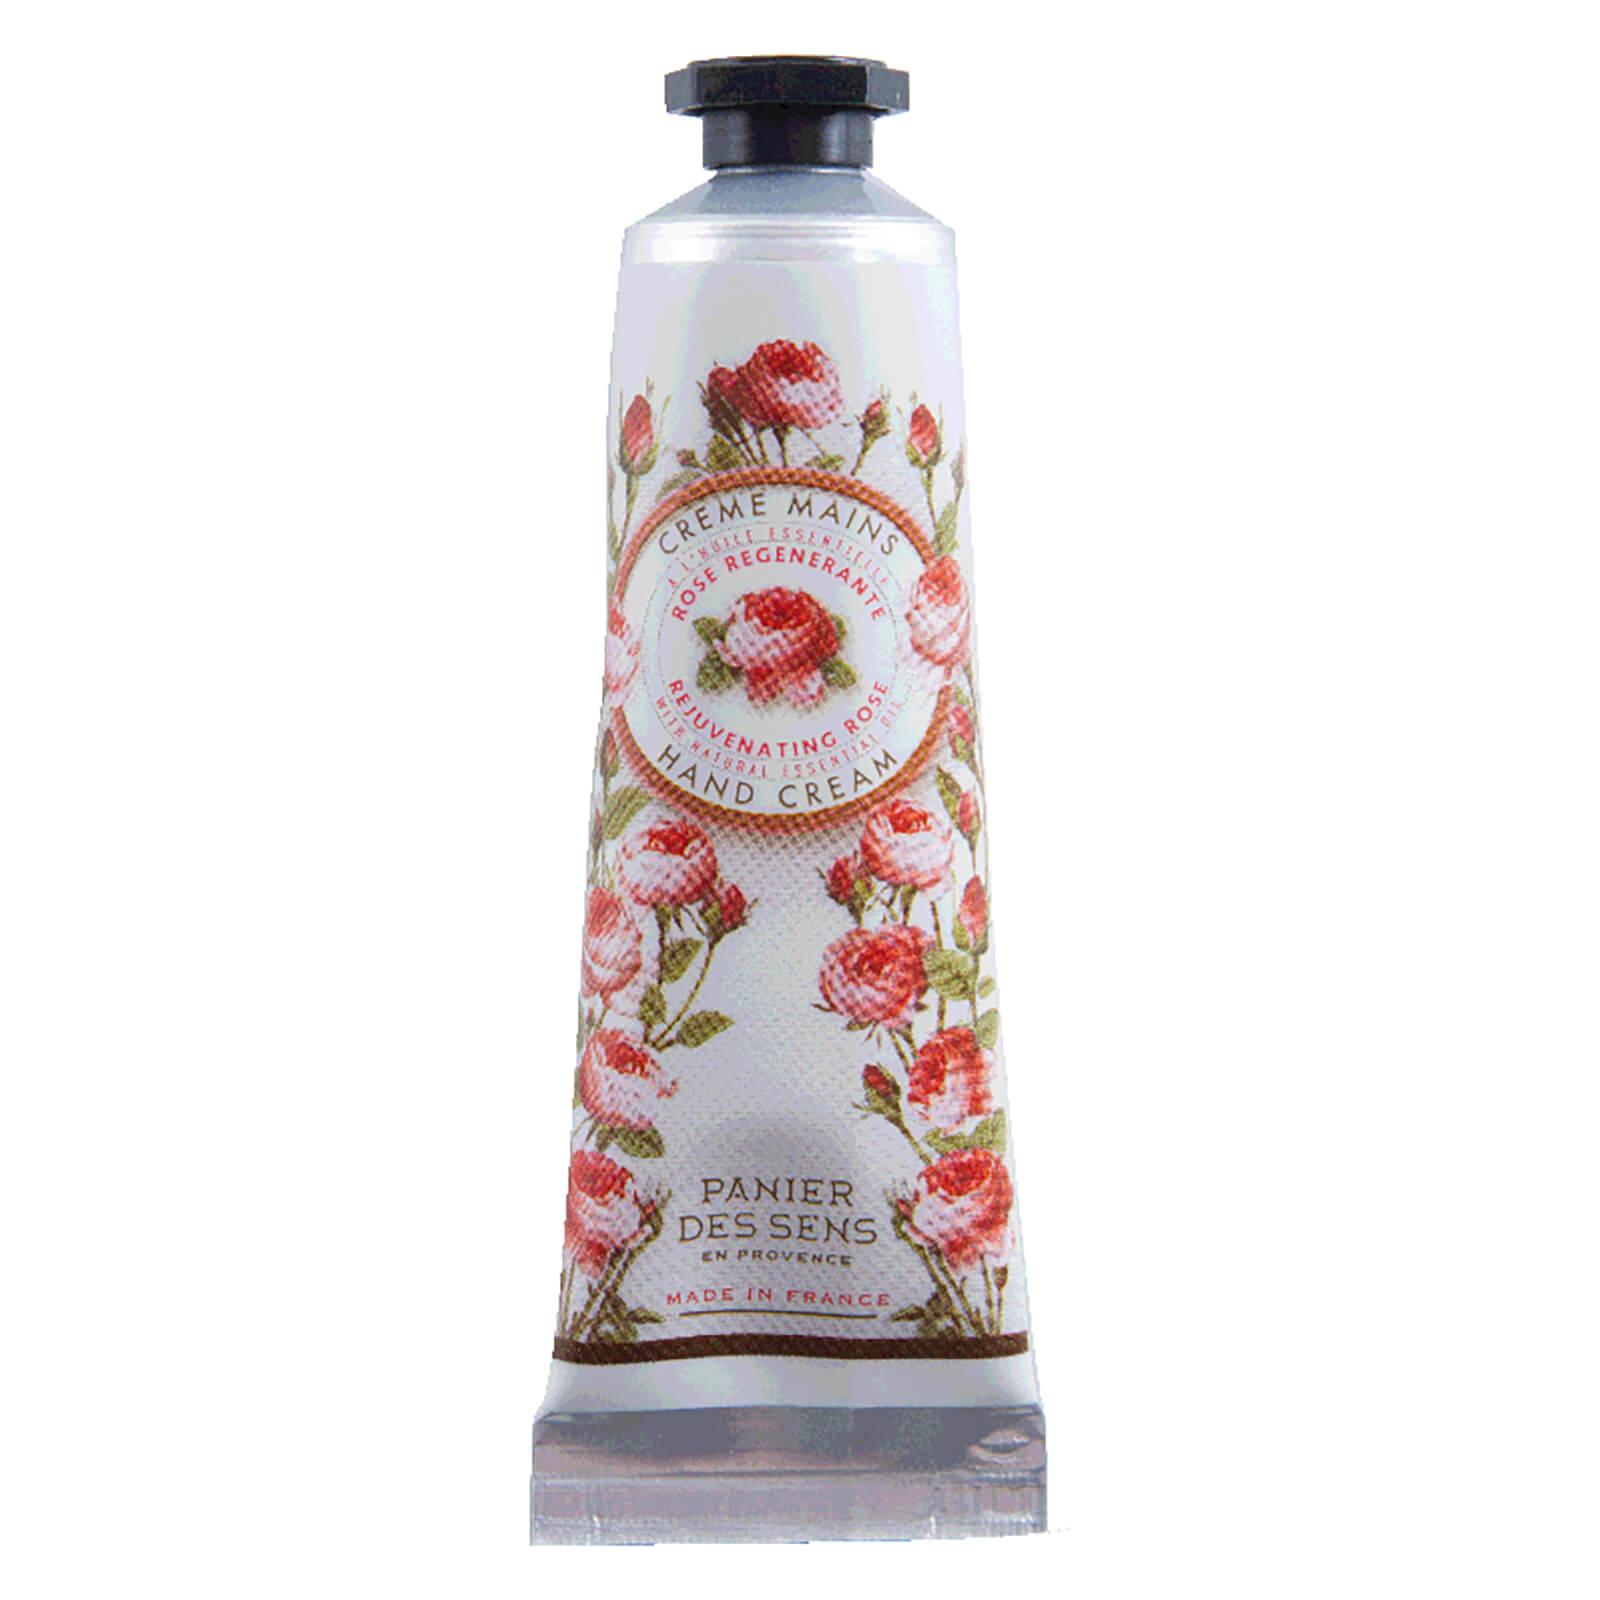 Купить Panier des Sens The Essentials Rejuvenating Rose Hand Cream